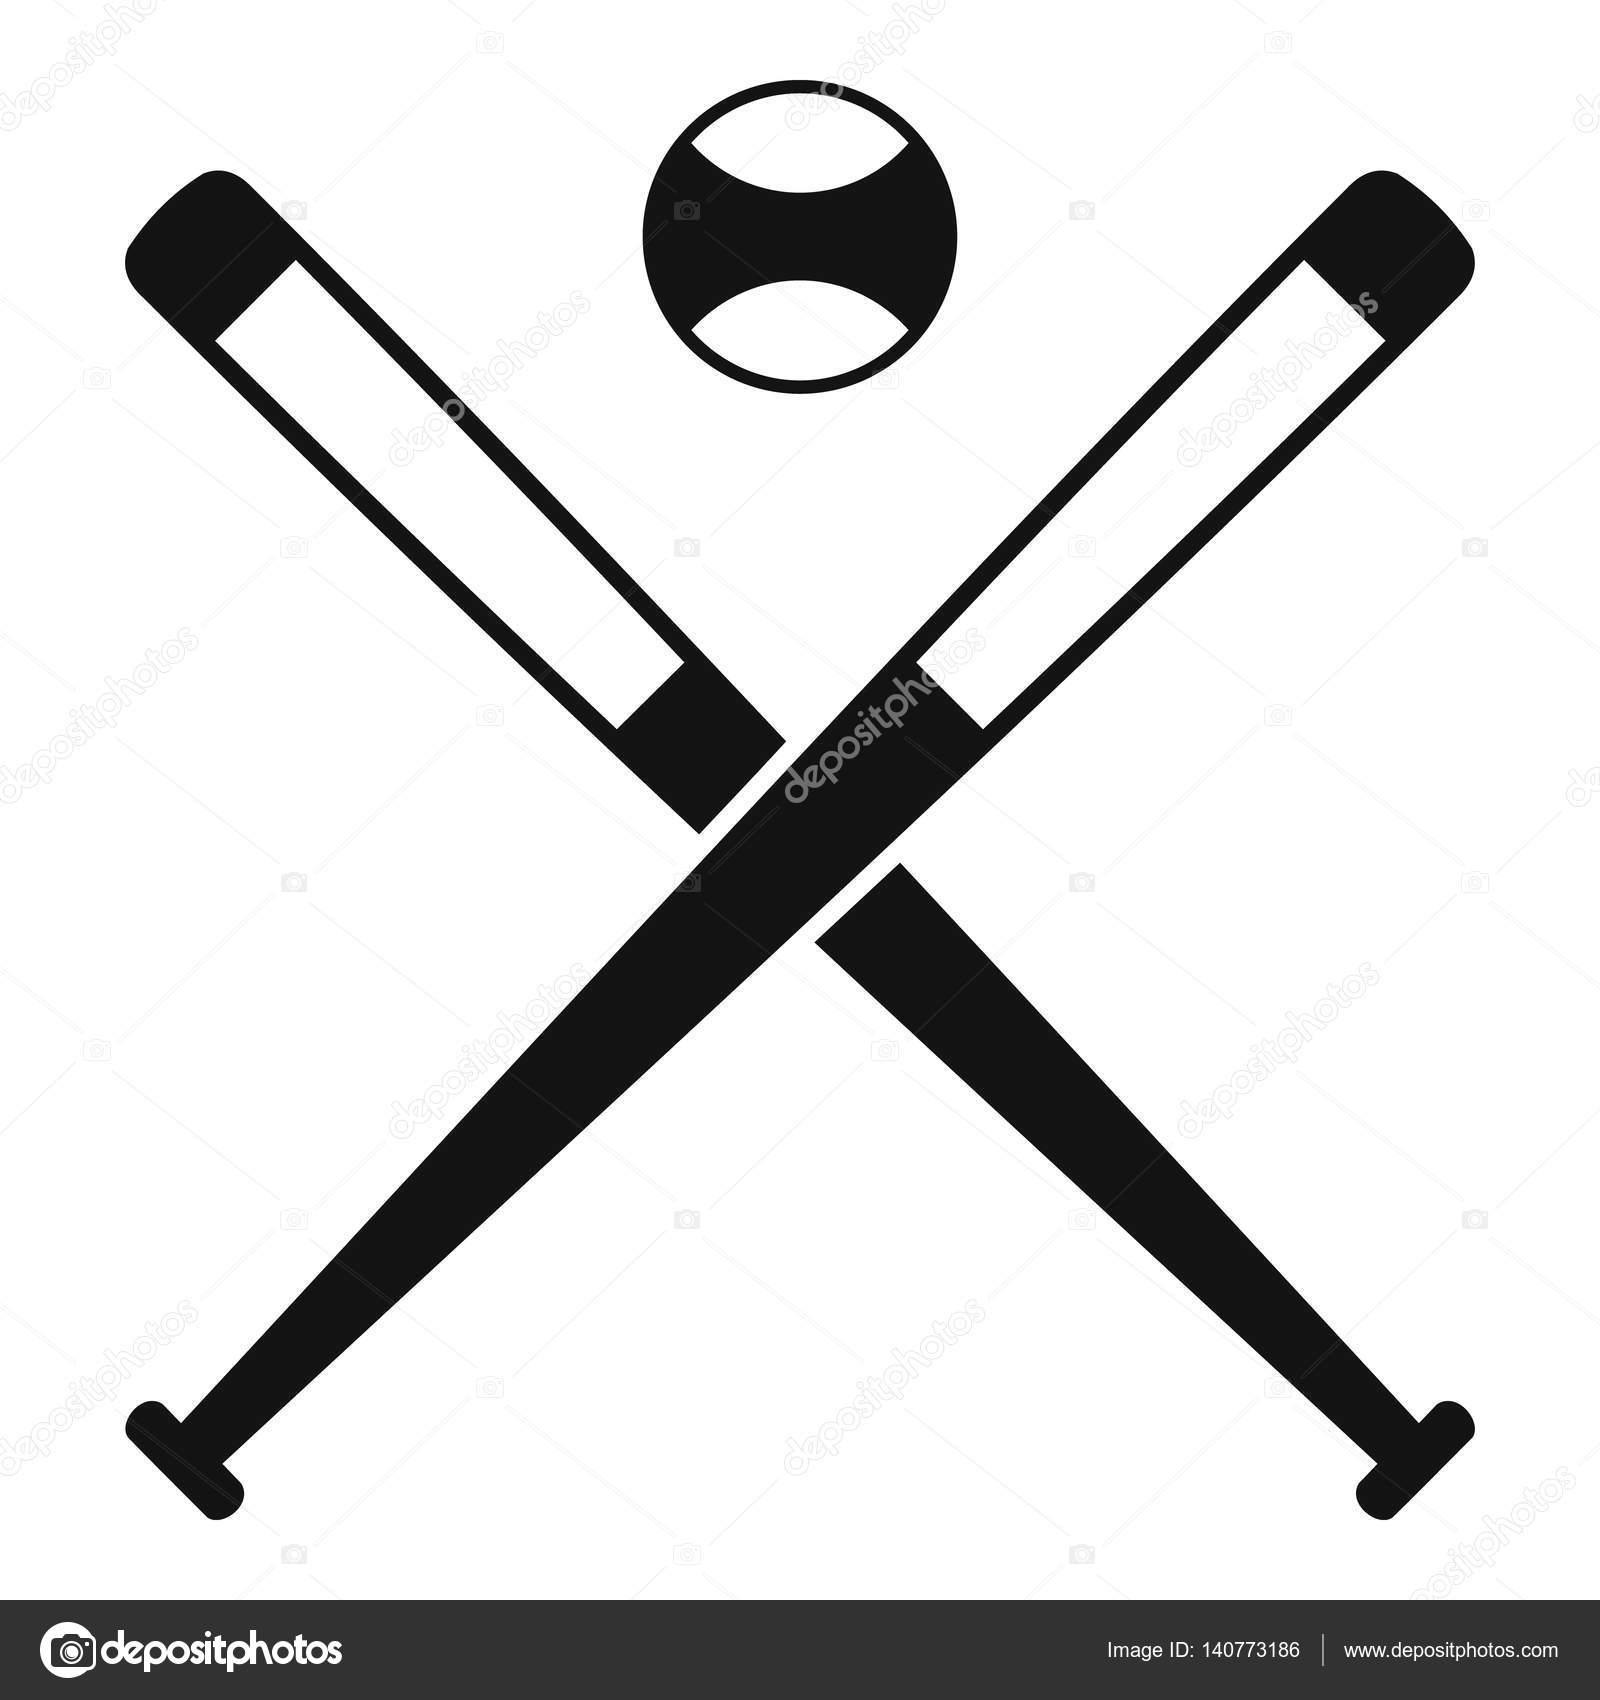 crossed baseball bats and ball icon simple style stock vector rh depositphotos com Baseball Bat Vector Silhouette Baseball Bats Crossed with Ball